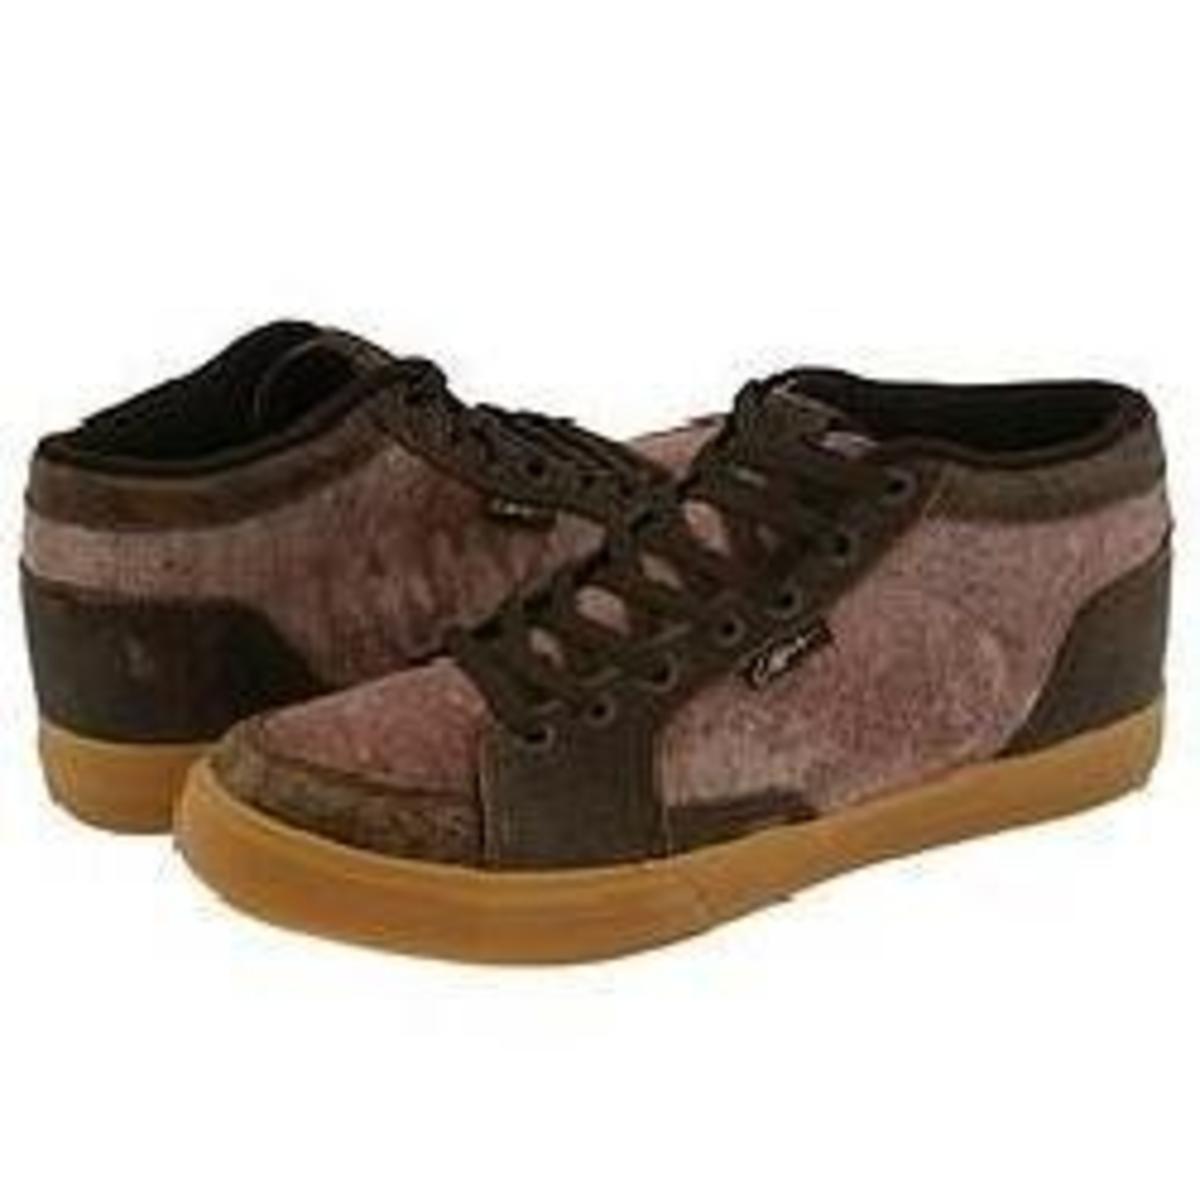 Circa Skateboard Schuhe Pusher Chocolade Tie-dye Crepe